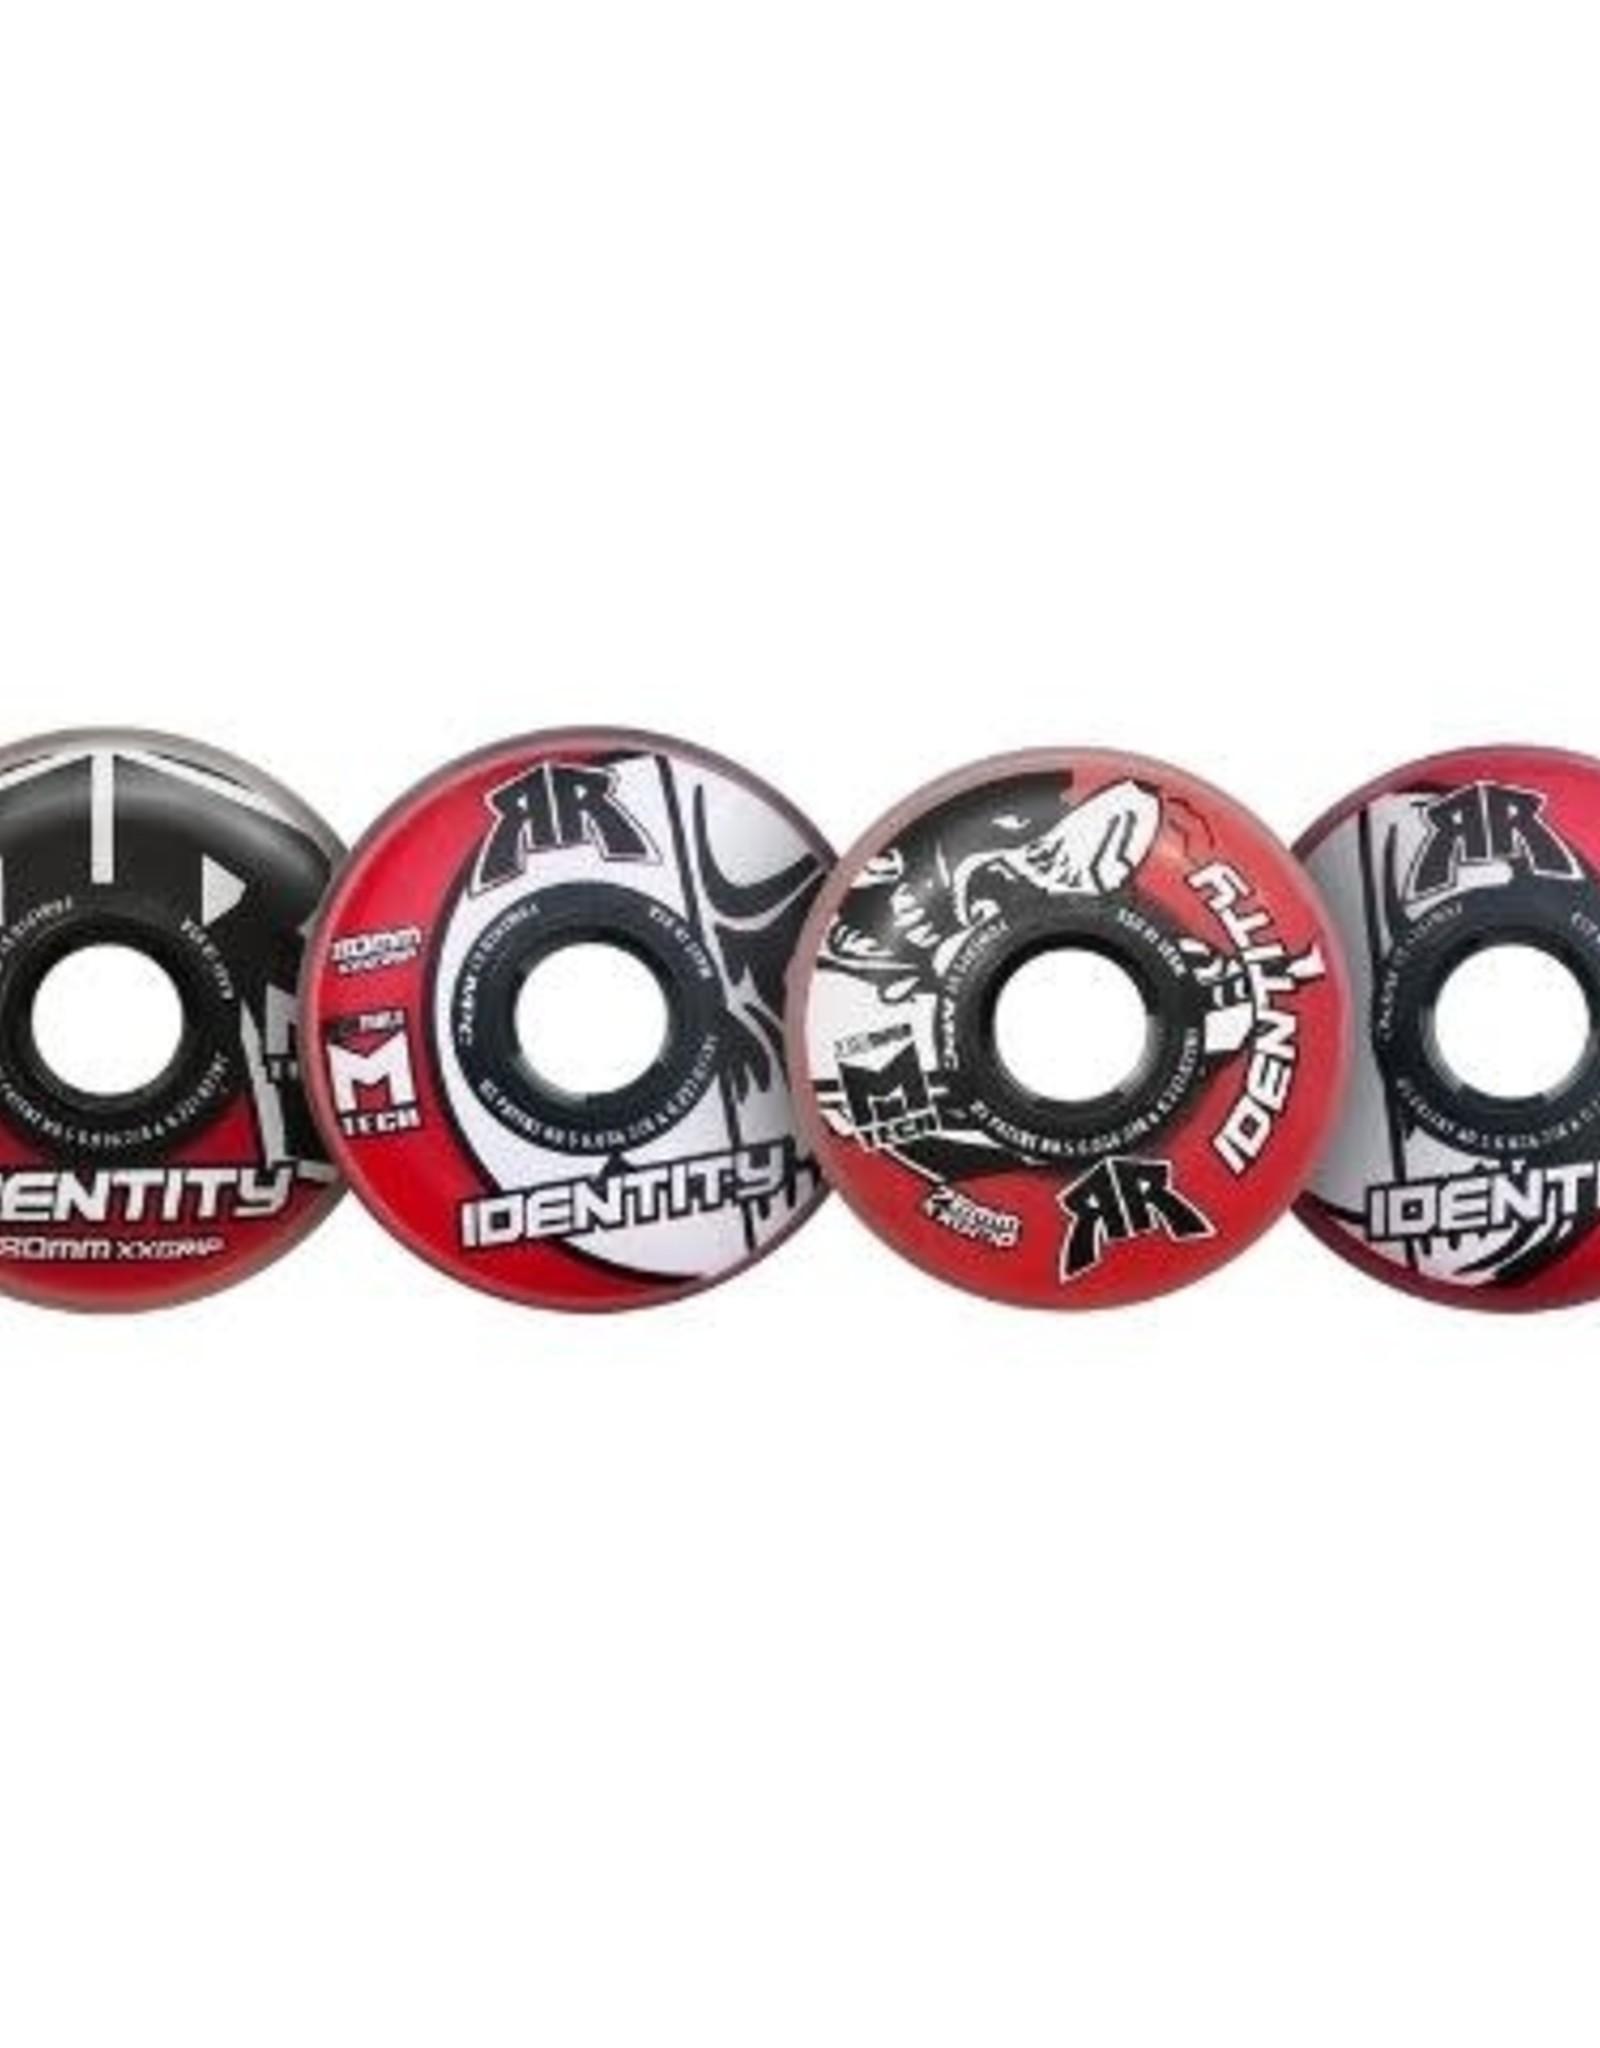 Rink Rat Rink Rat Identity 76mm Wheel (Red) XX